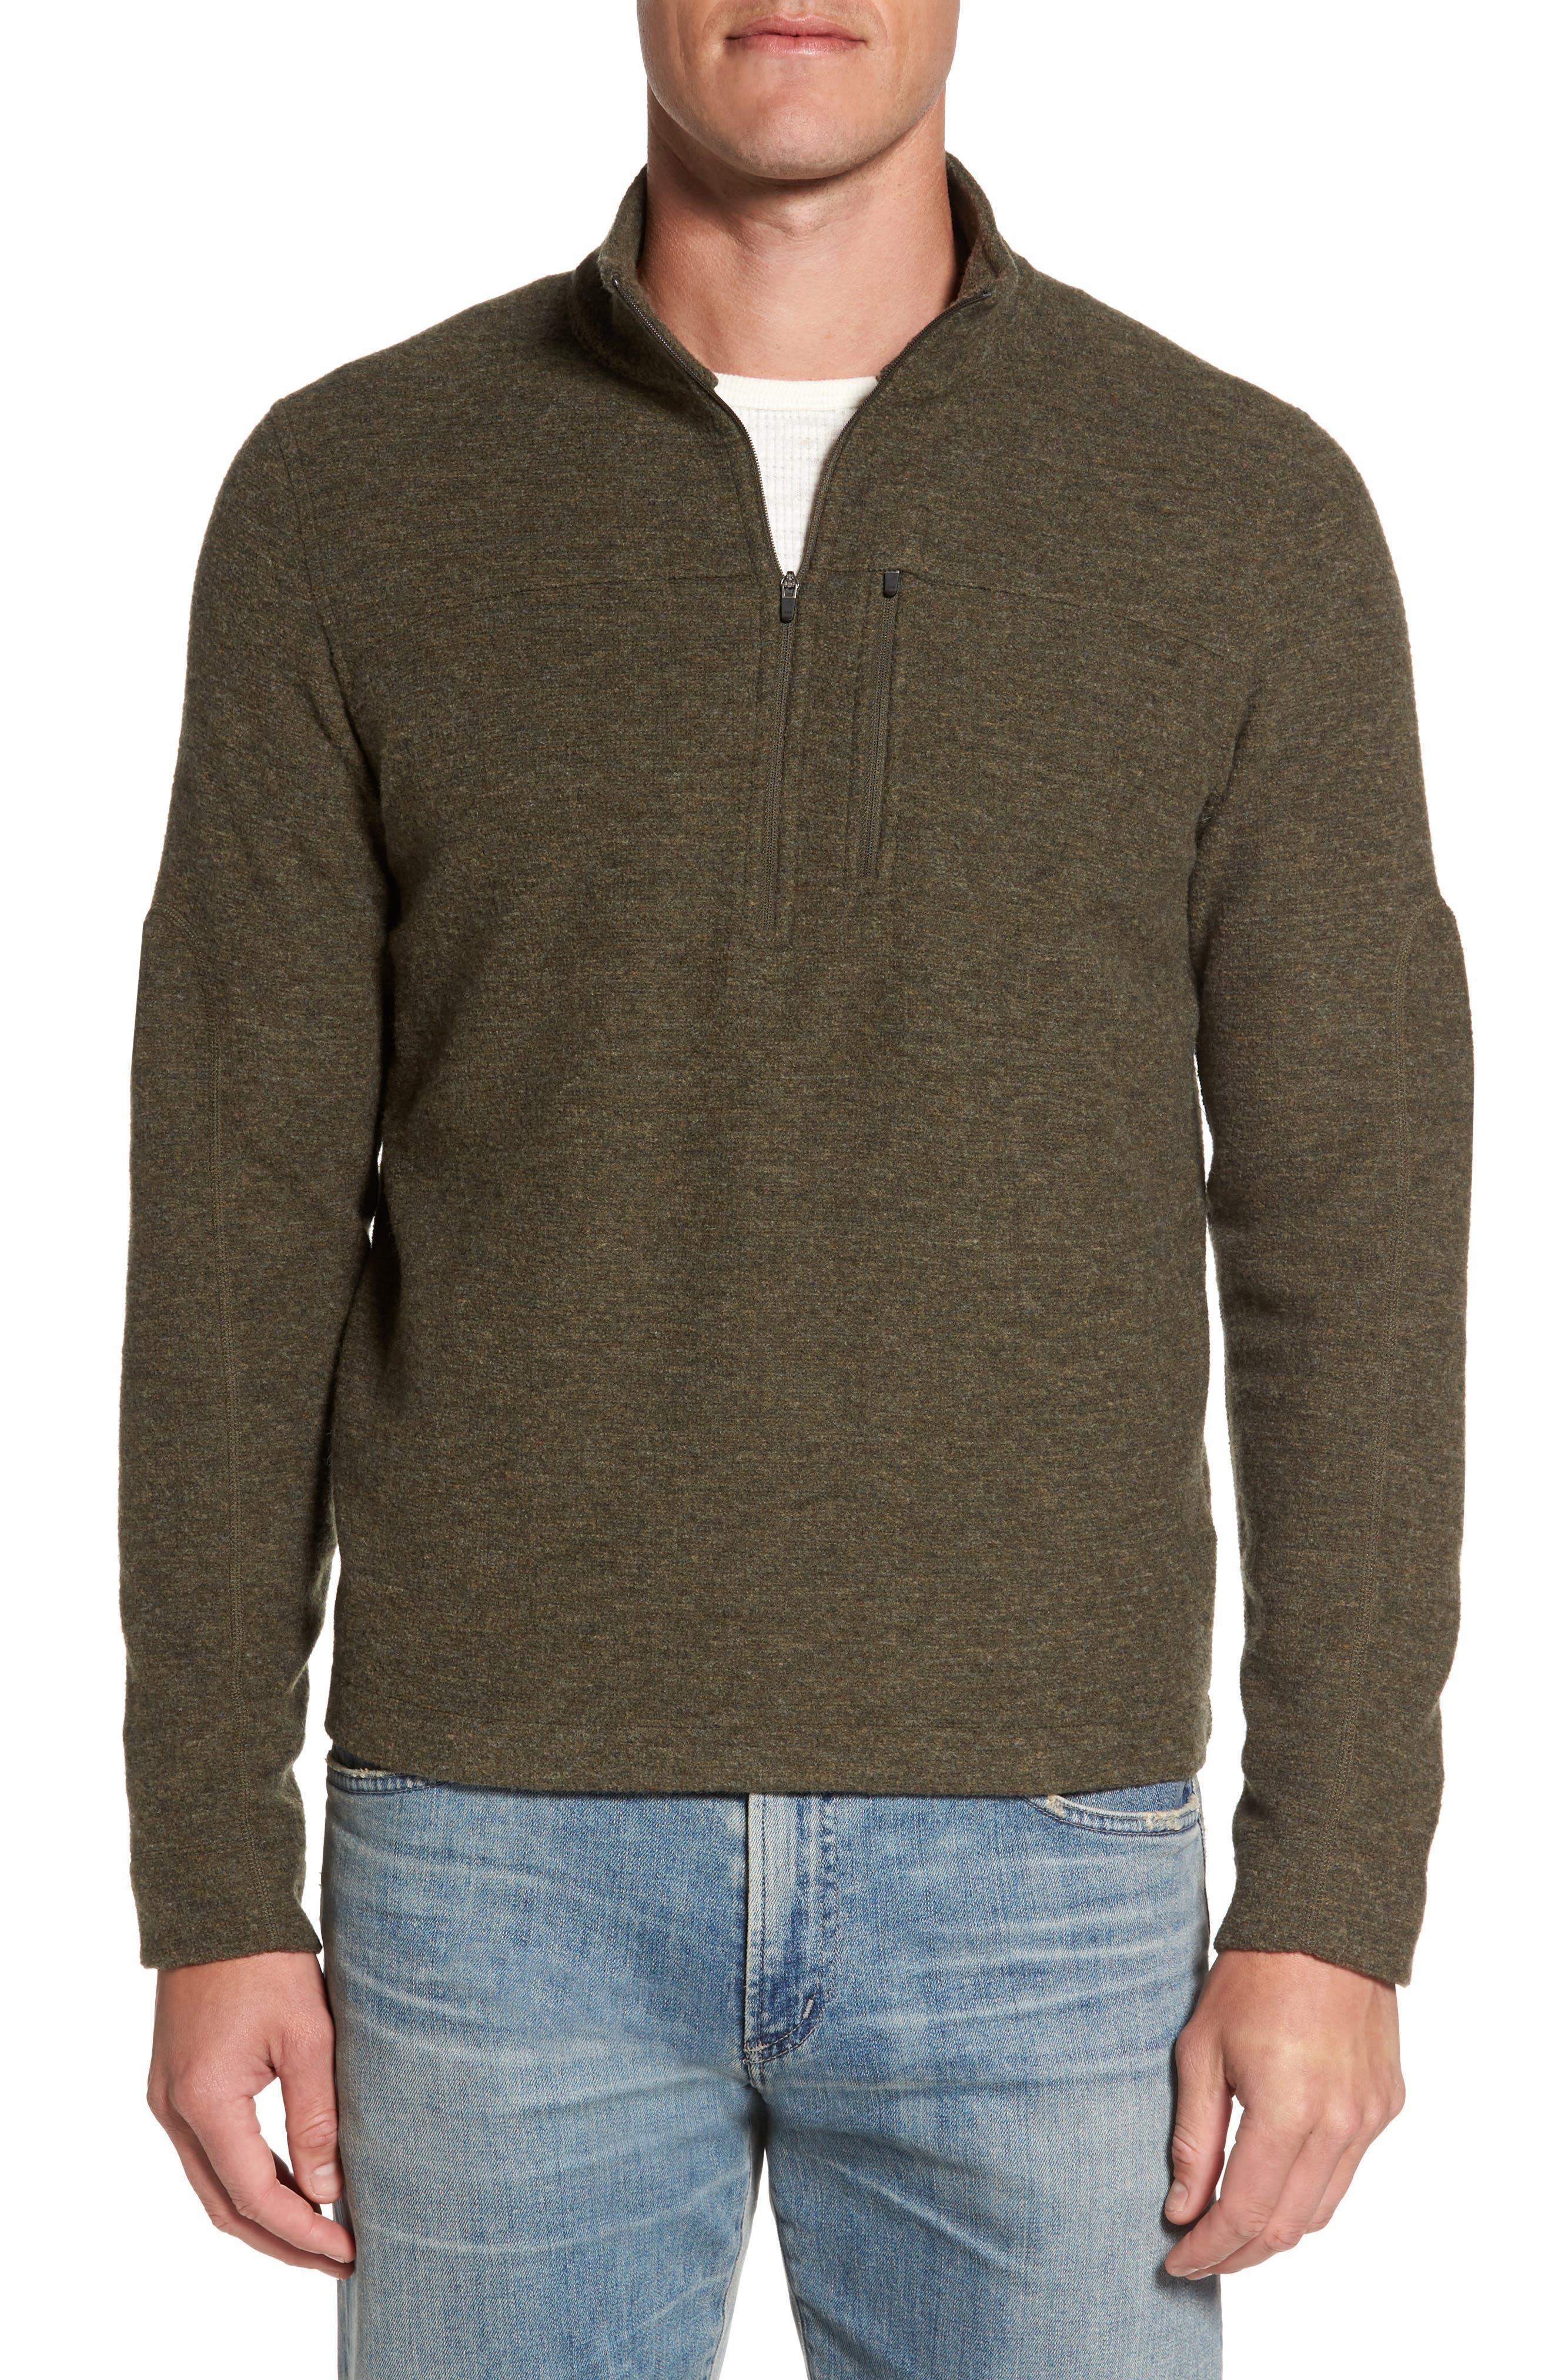 Main Image - ibex Scout Jura Merino Wool Blend Quarter Zip Pullover